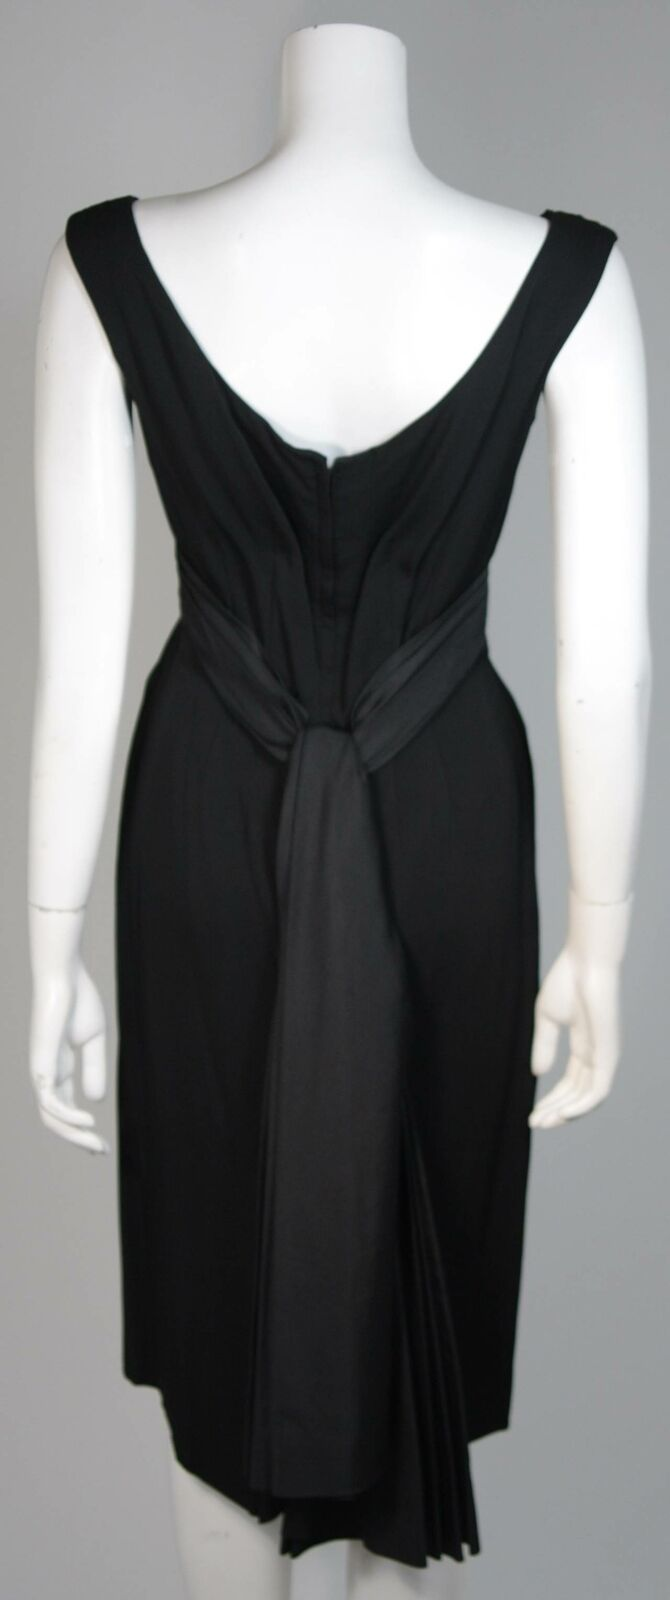 CEIL CHAPMAN 1950s Black Draped Cocktail Dress Si… - image 6